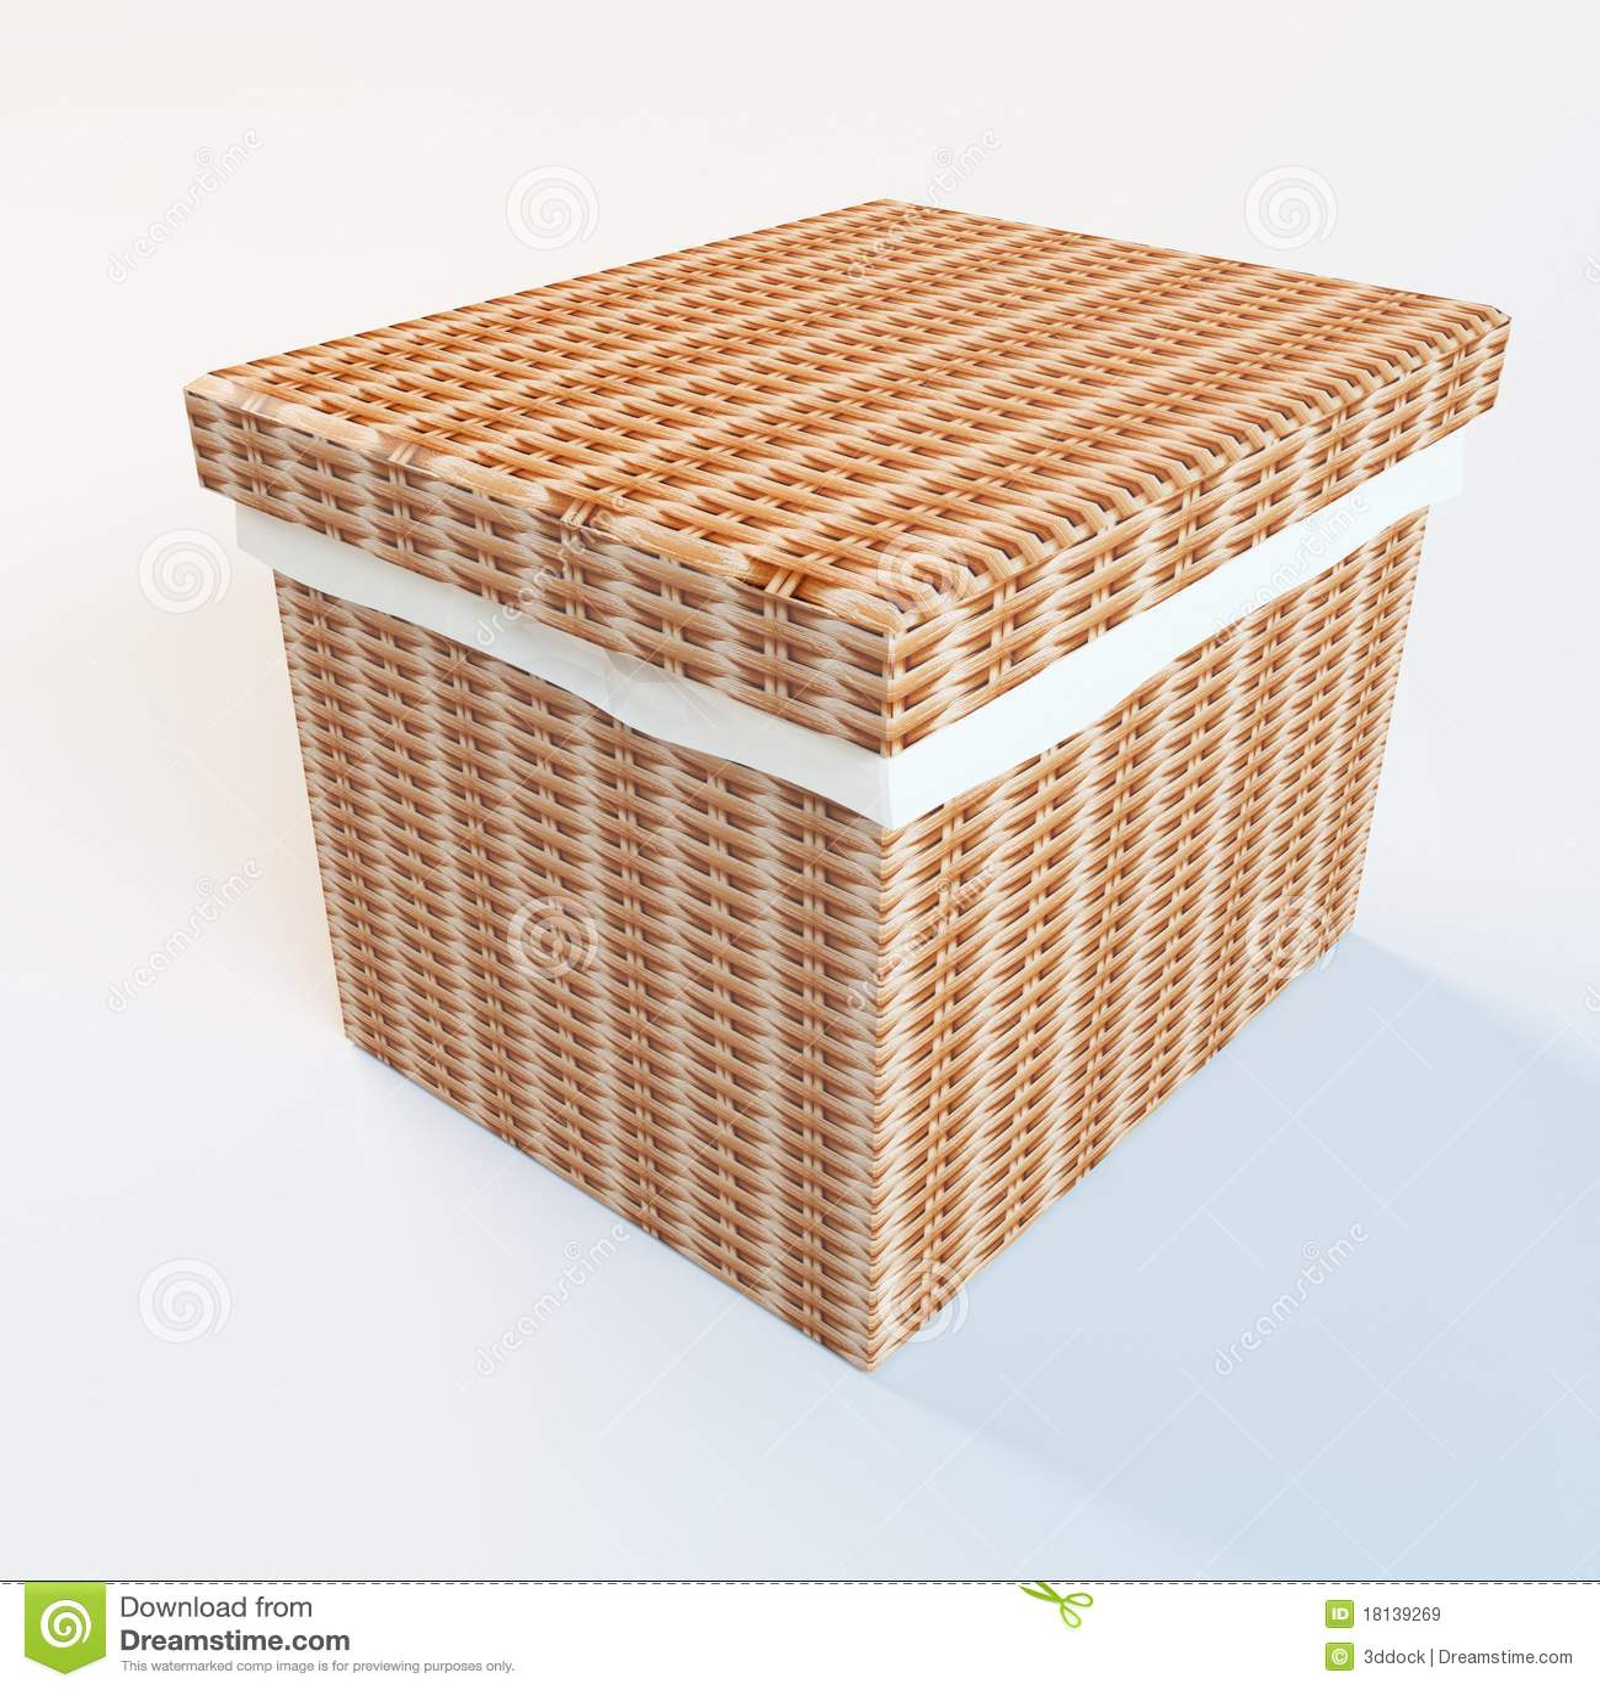 Cane laundry hamper royalty free stock images image 18139269 - Cane laundry hamper ...